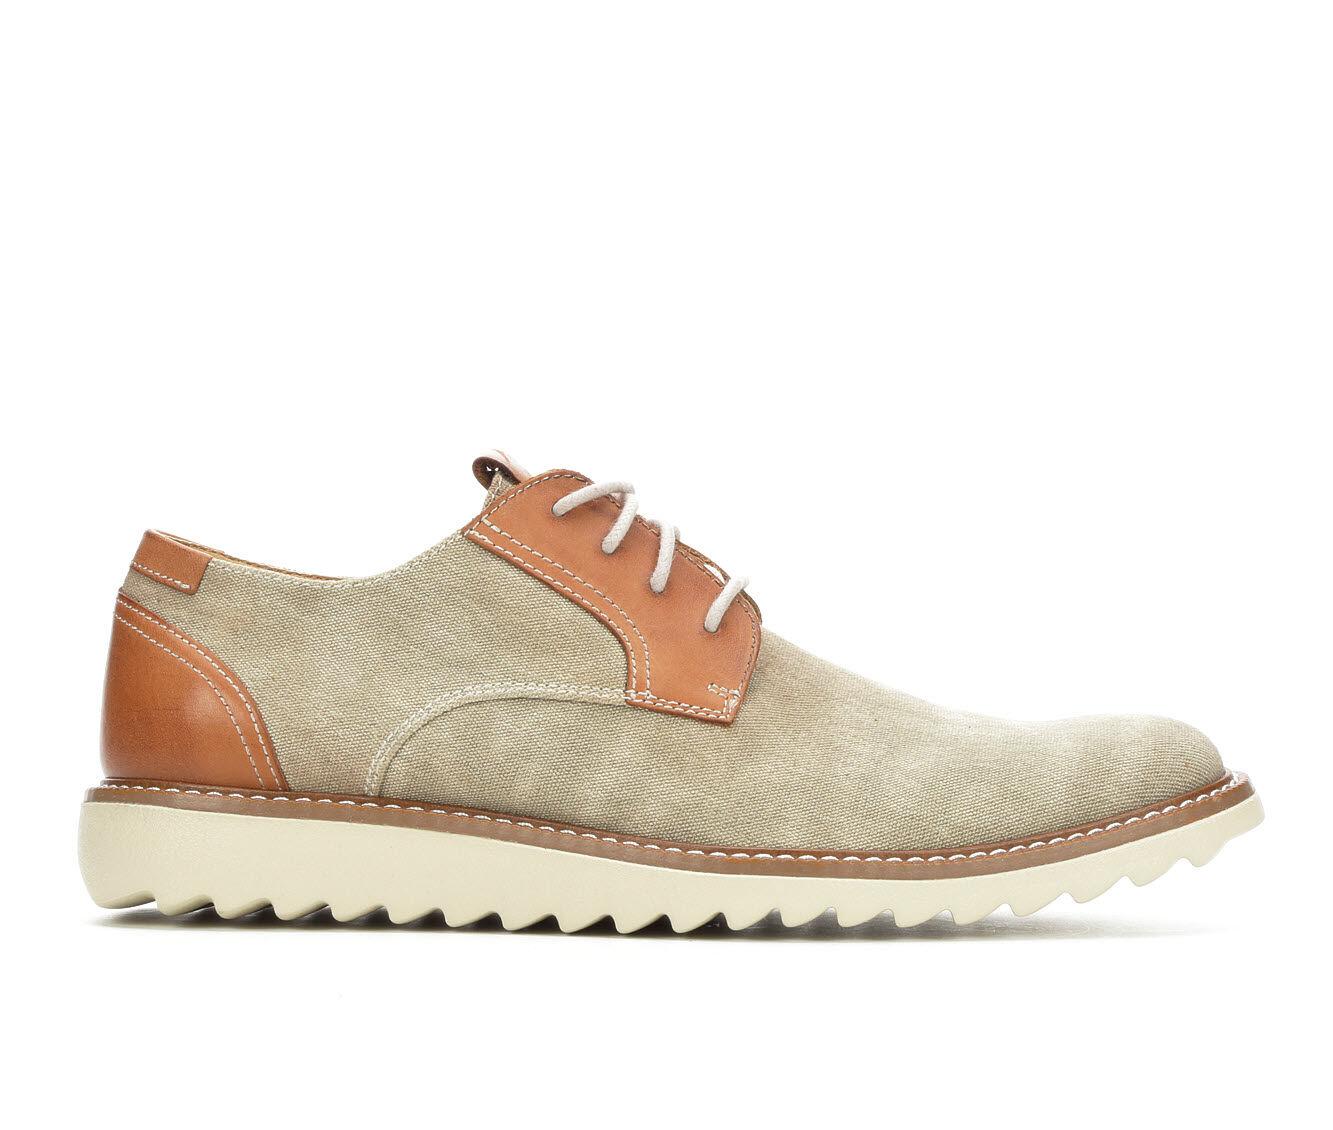 uk shoes_kd1244